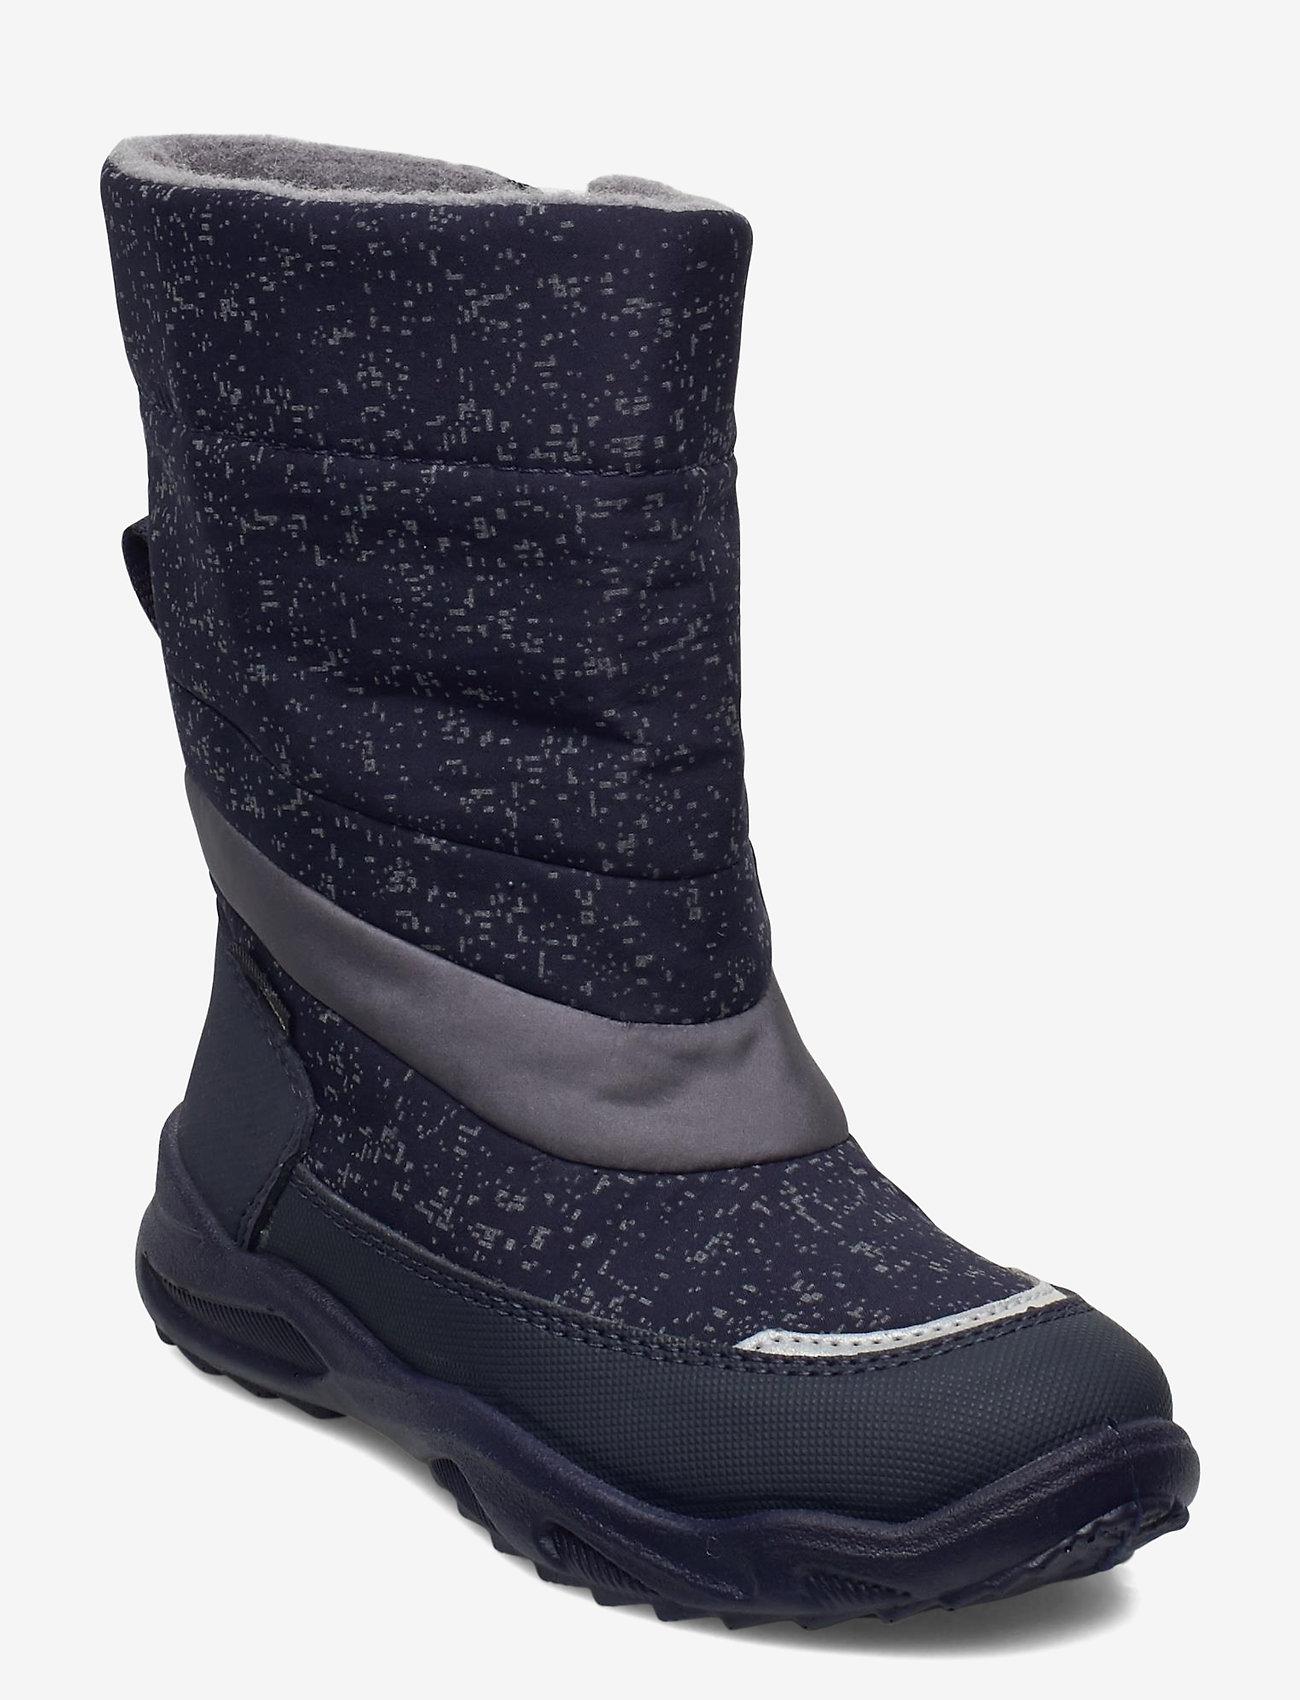 Superfit Mens Glacier Snow Boot